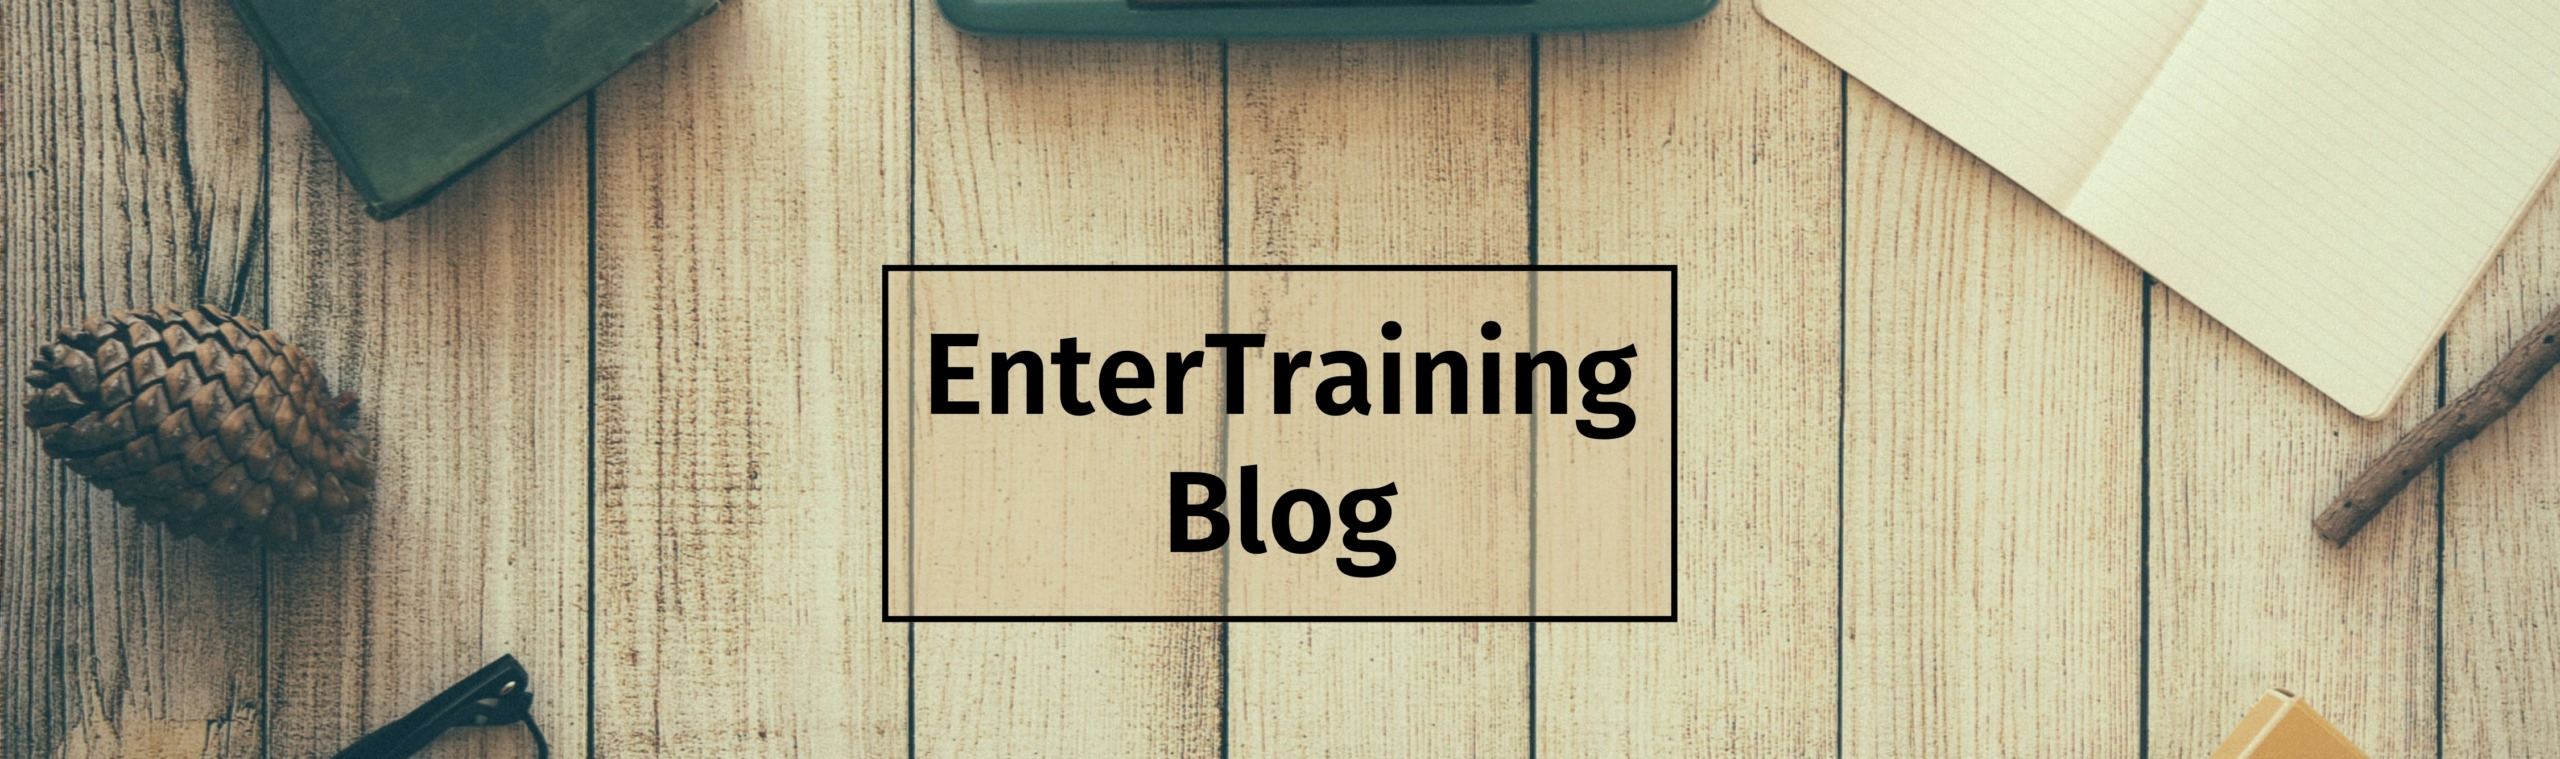 Entertraining blog